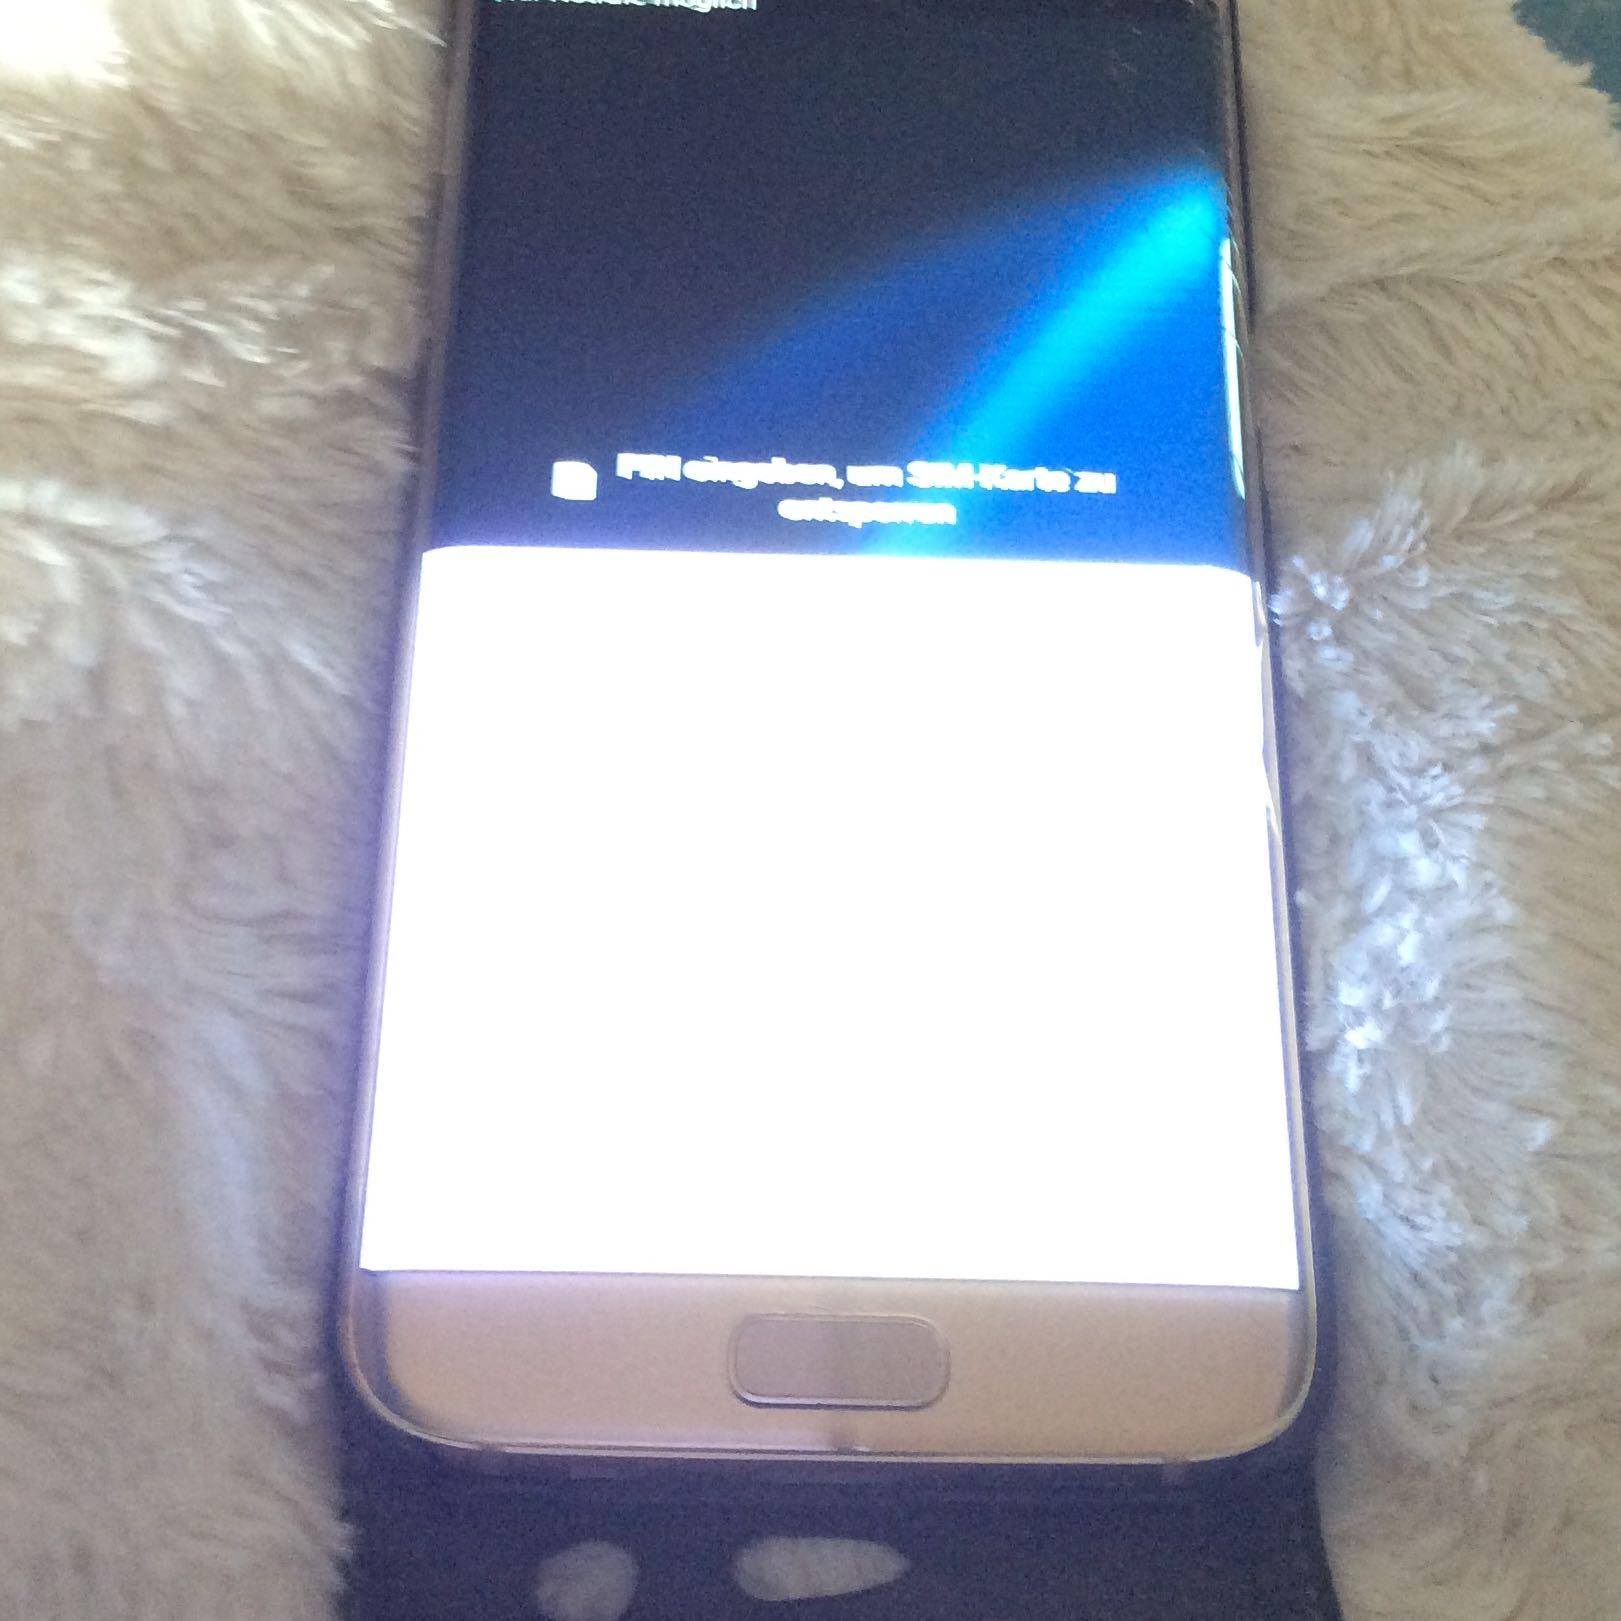 Samsung Tablet Bildschirm Flackert